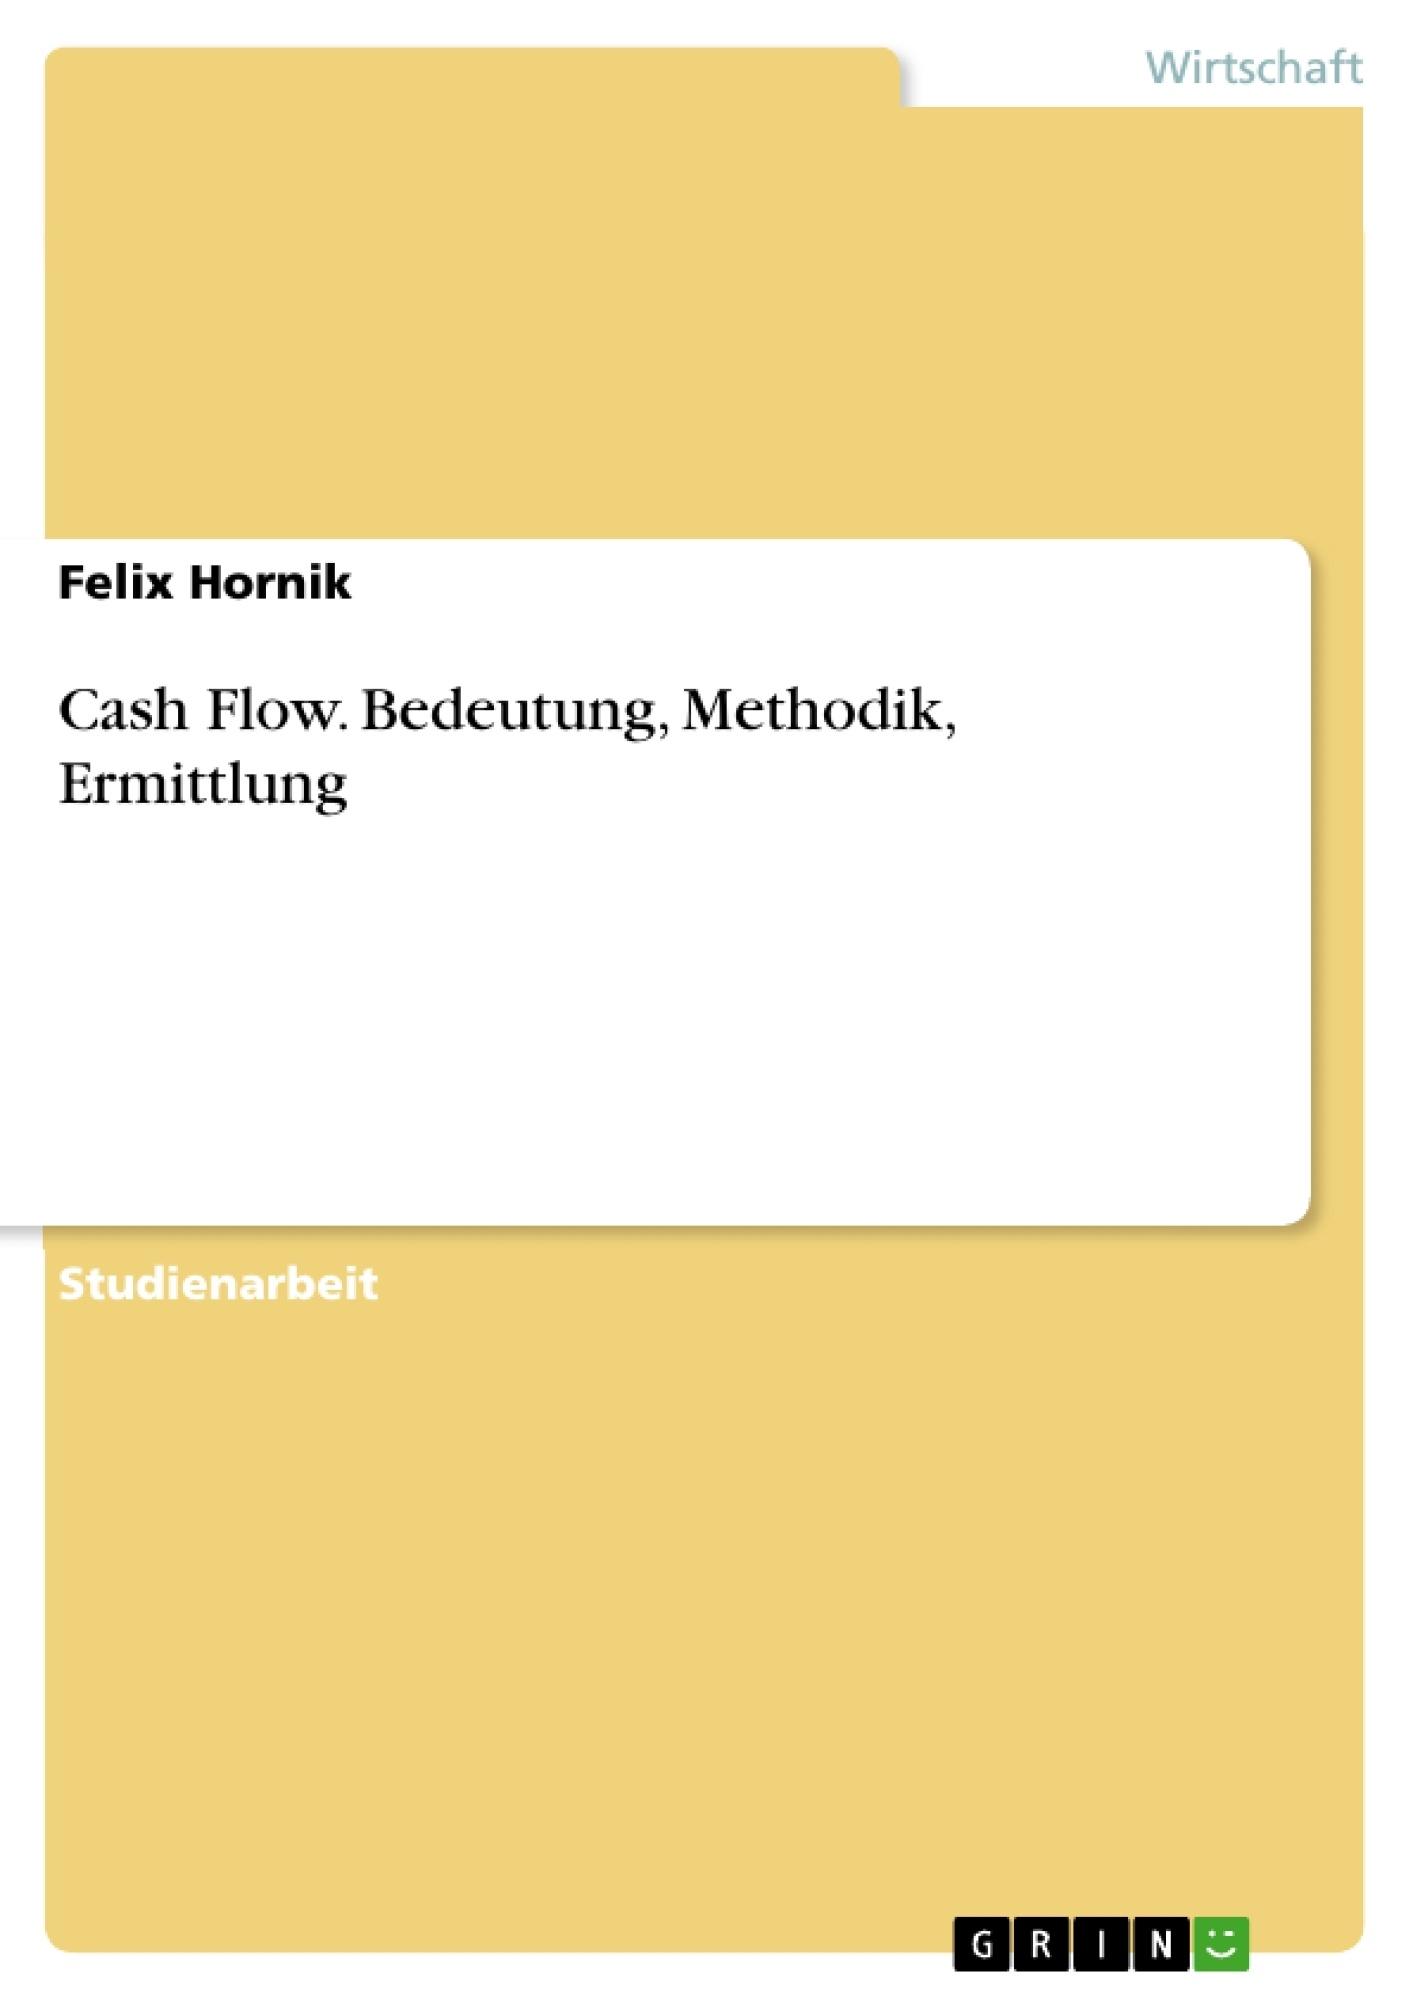 Titel: Cash Flow. Bedeutung, Methodik, Ermittlung